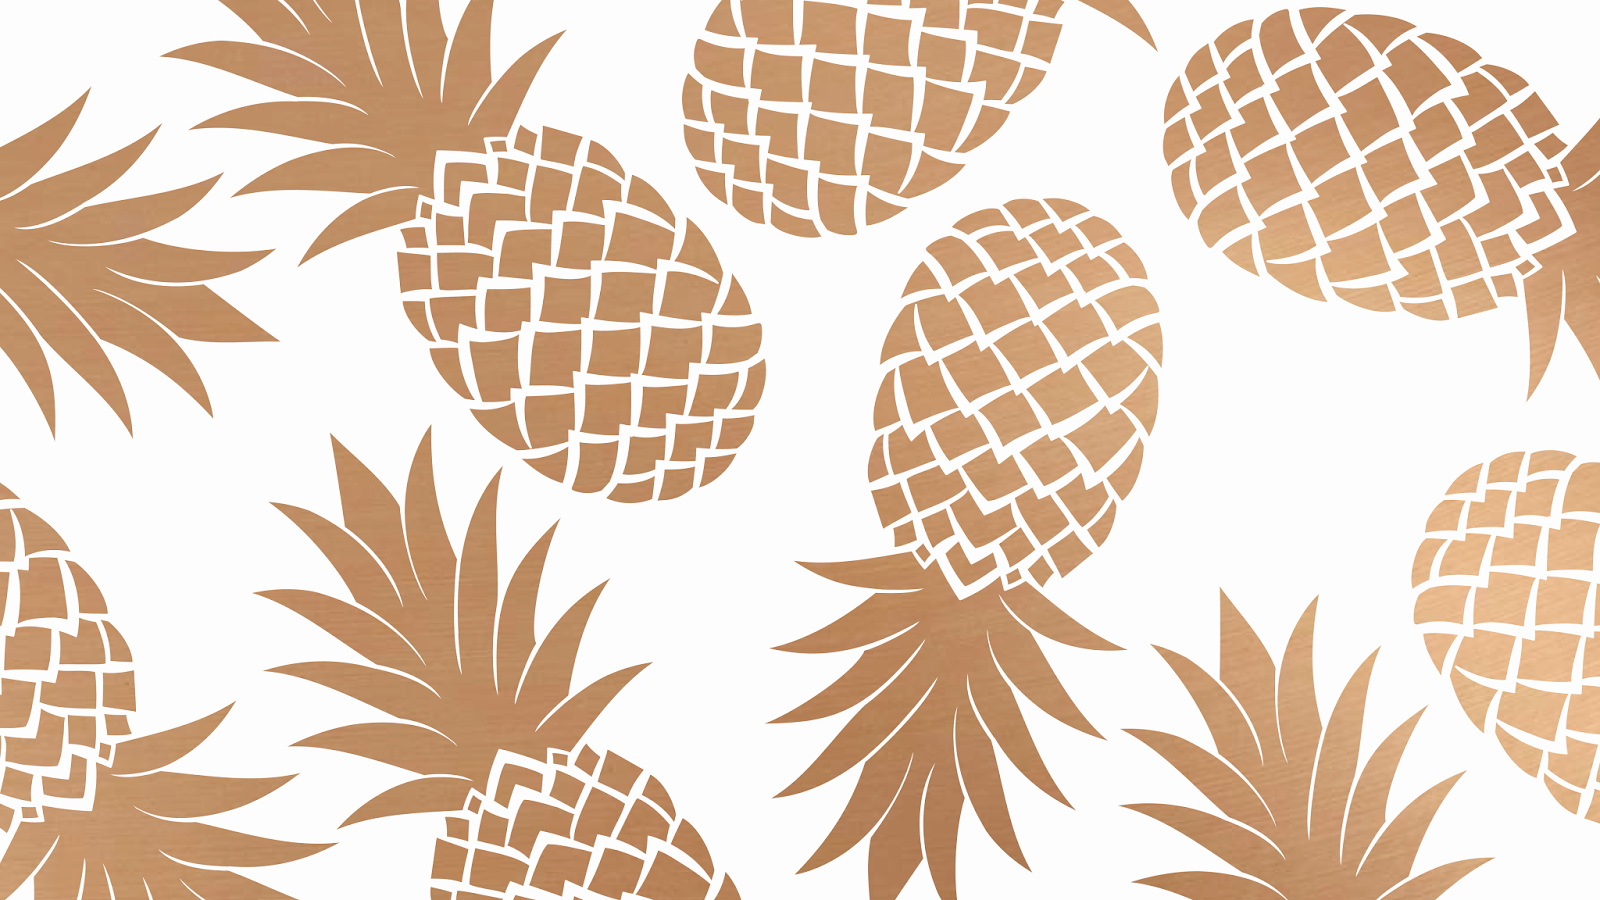 Ananas fond d 39 cran pinterest cran for Fond ecran ananas